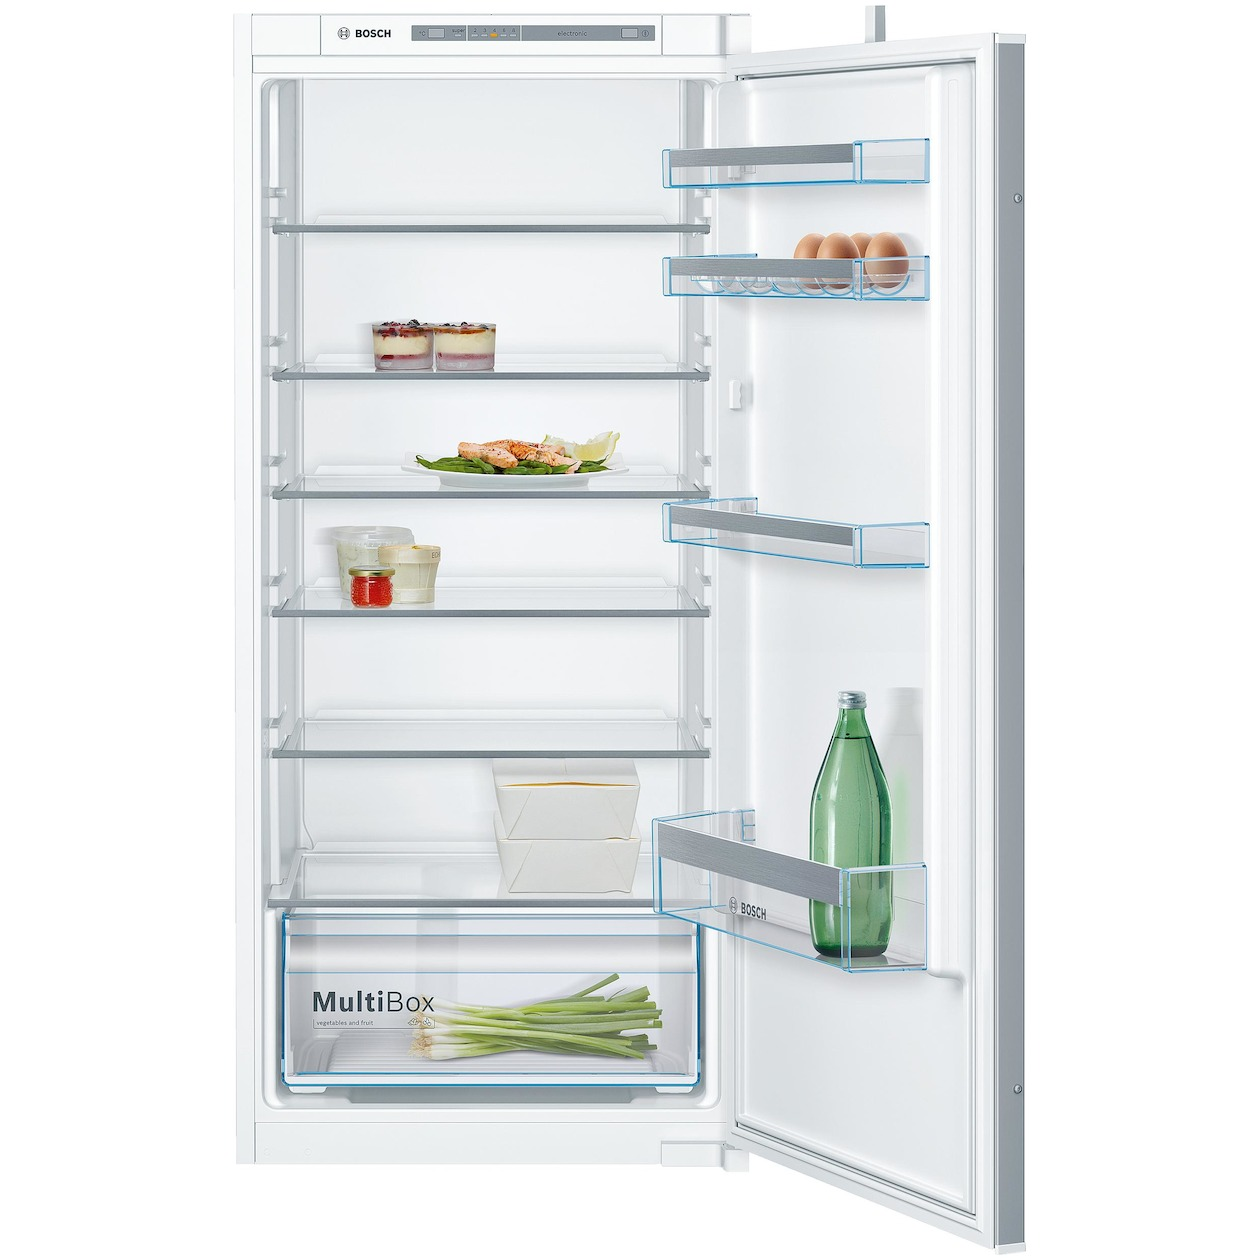 Bosch inbouw koelkast KIR41VF30